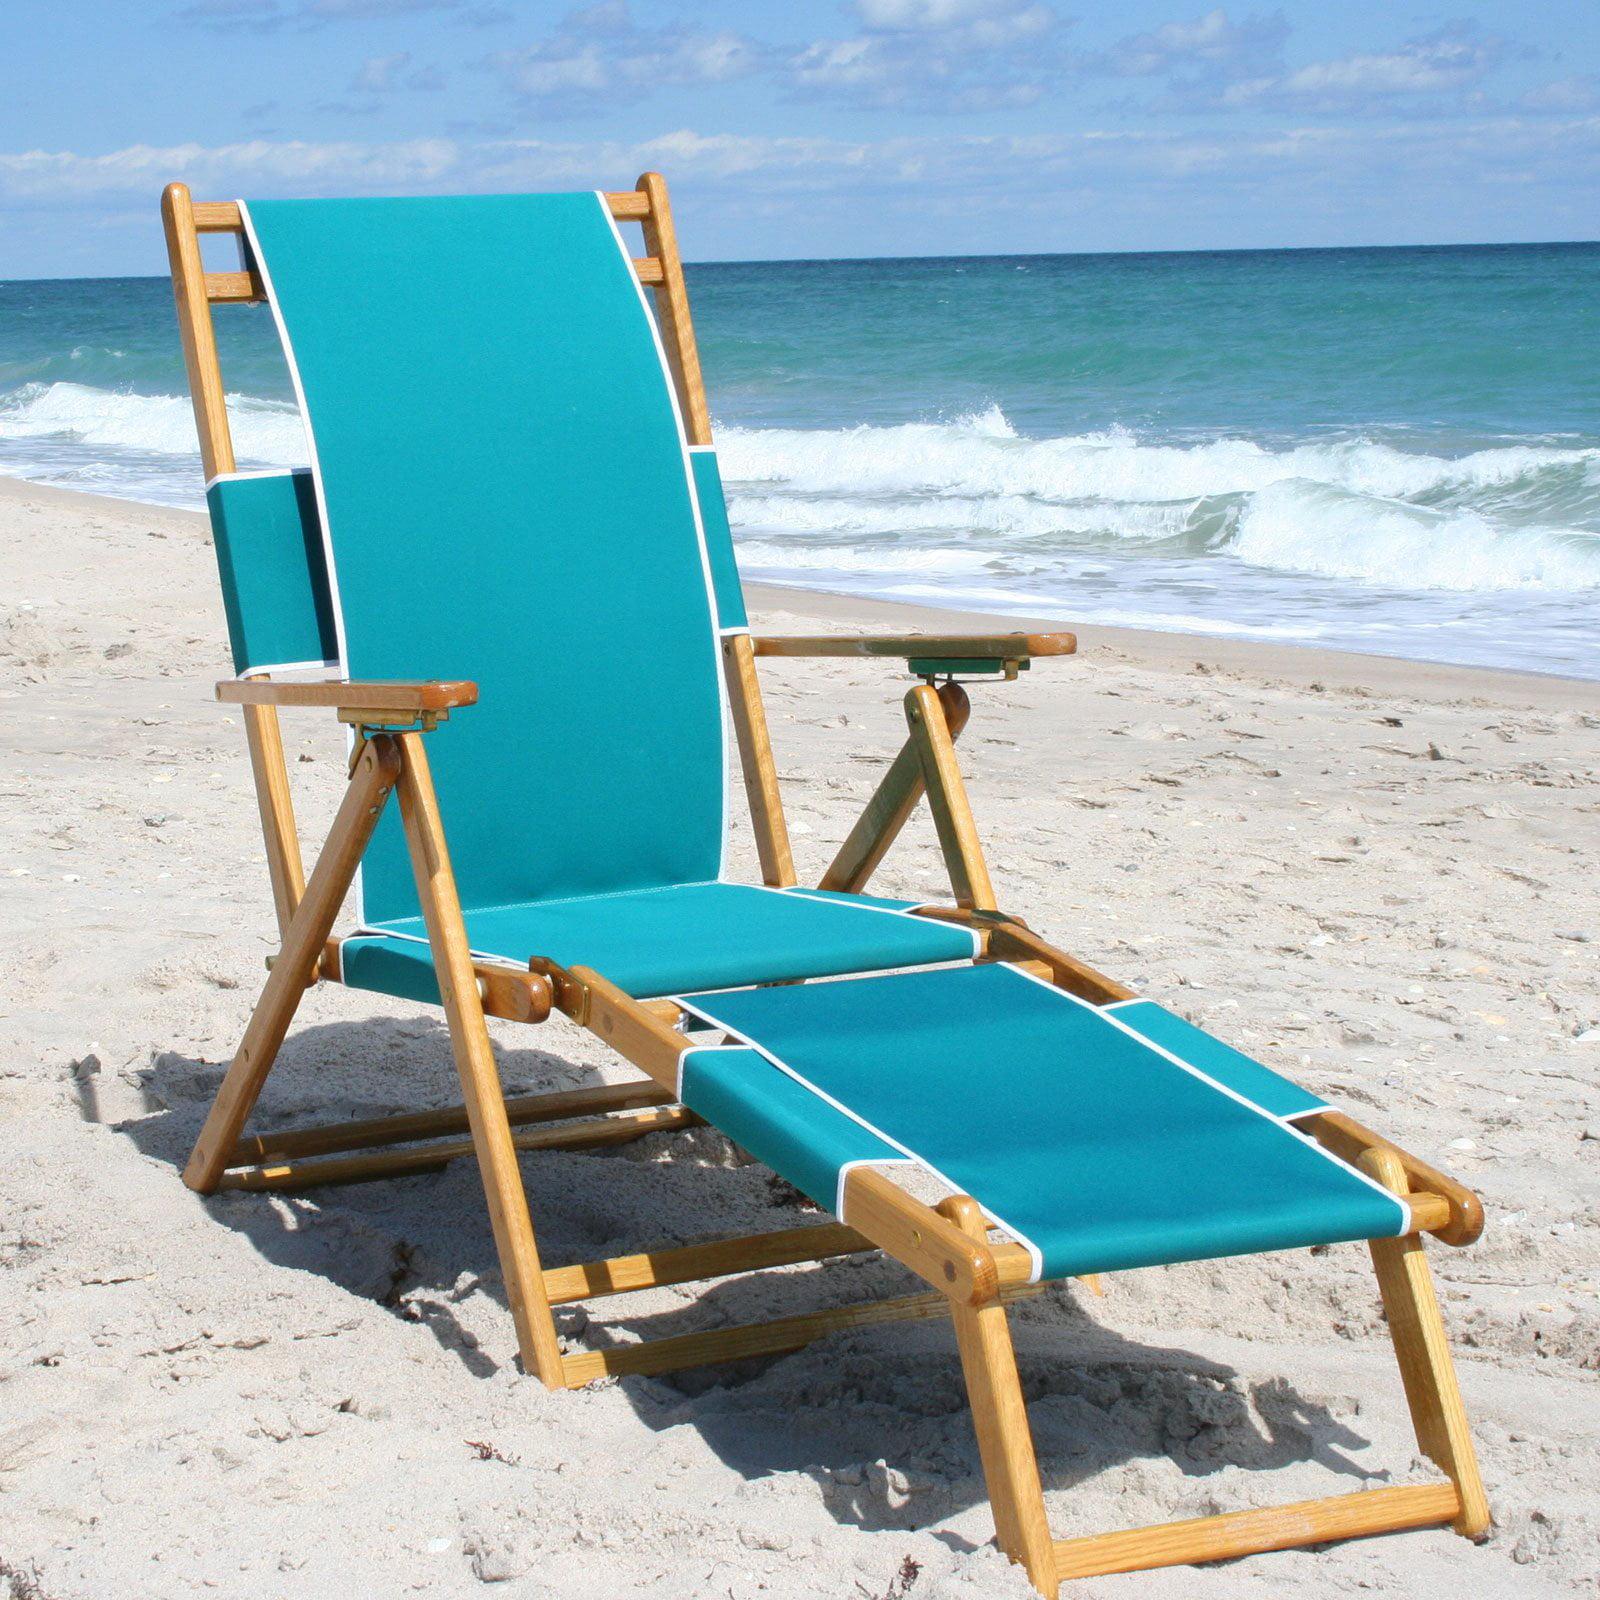 Amazing The Original Anywhere Chair Sunbrella Lounge Chair Inzonedesignstudio Interior Chair Design Inzonedesignstudiocom